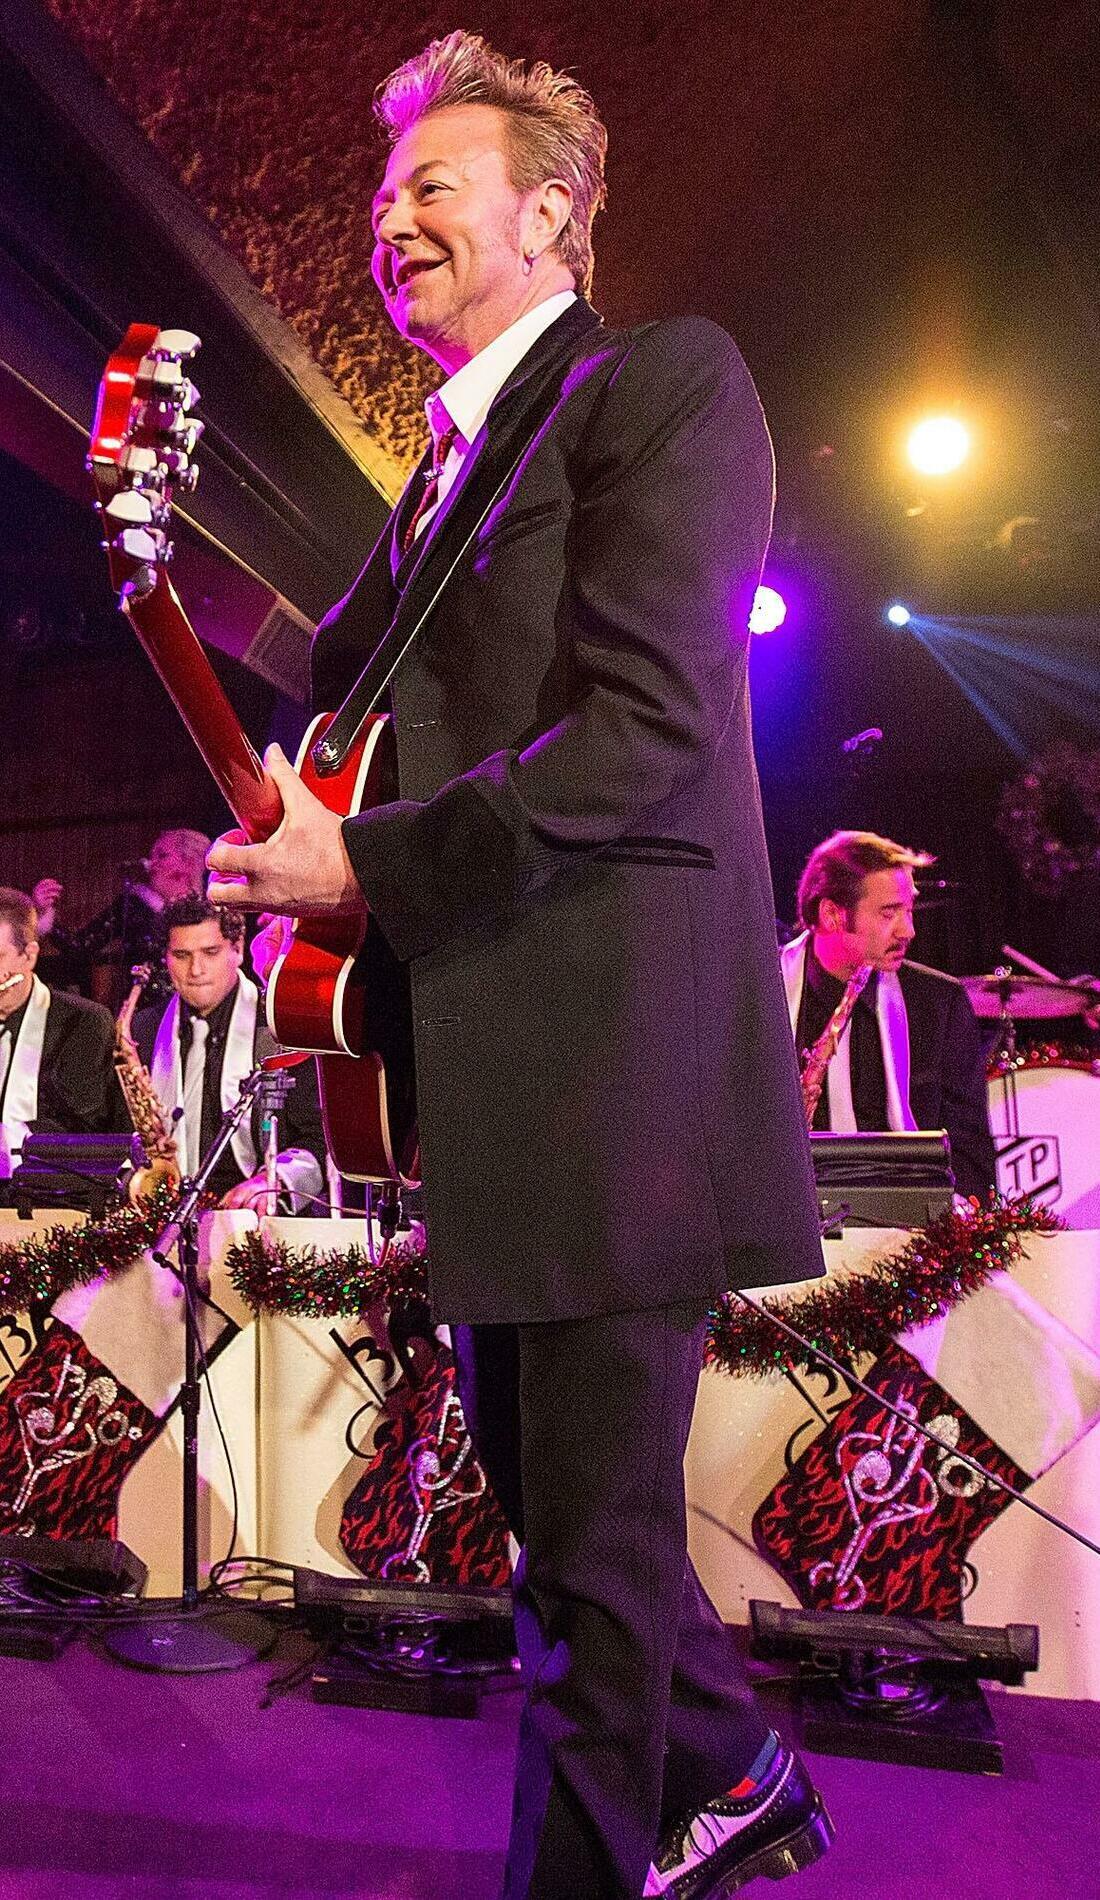 A The Brian Setzer Orchestra live event